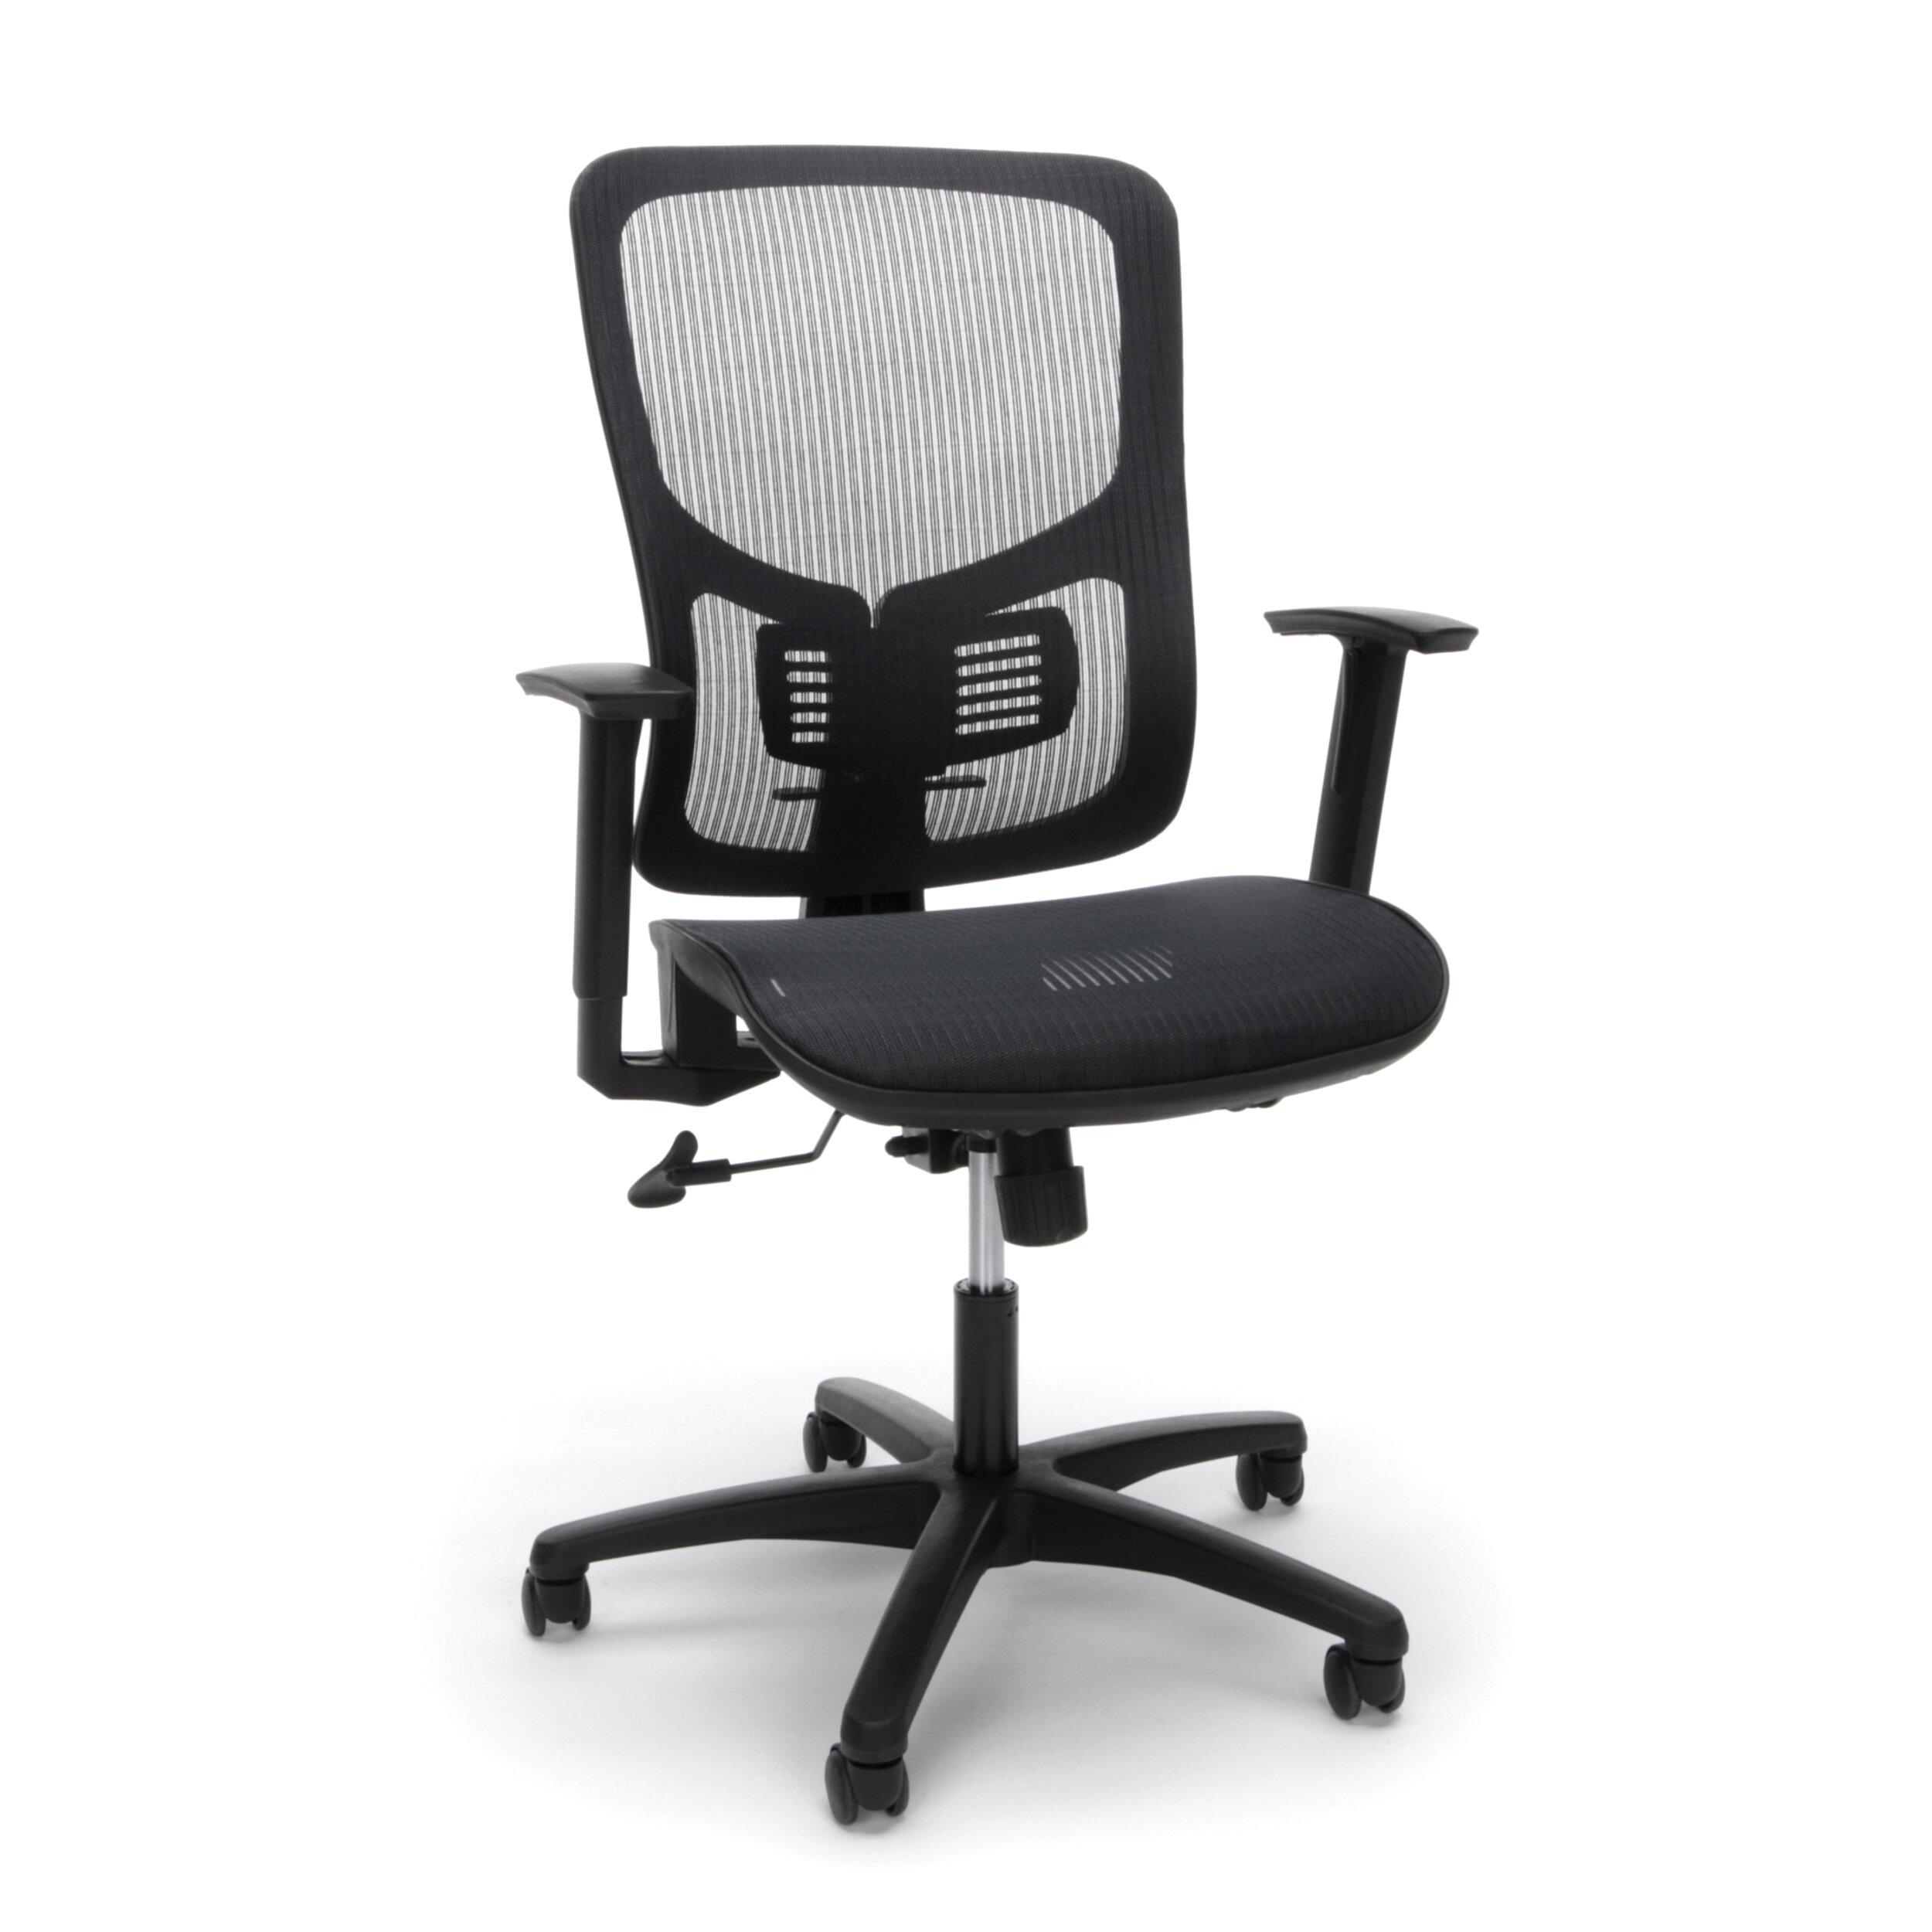 ergonomic all mesh office chair tcentric hybrid all mesh ergonomic